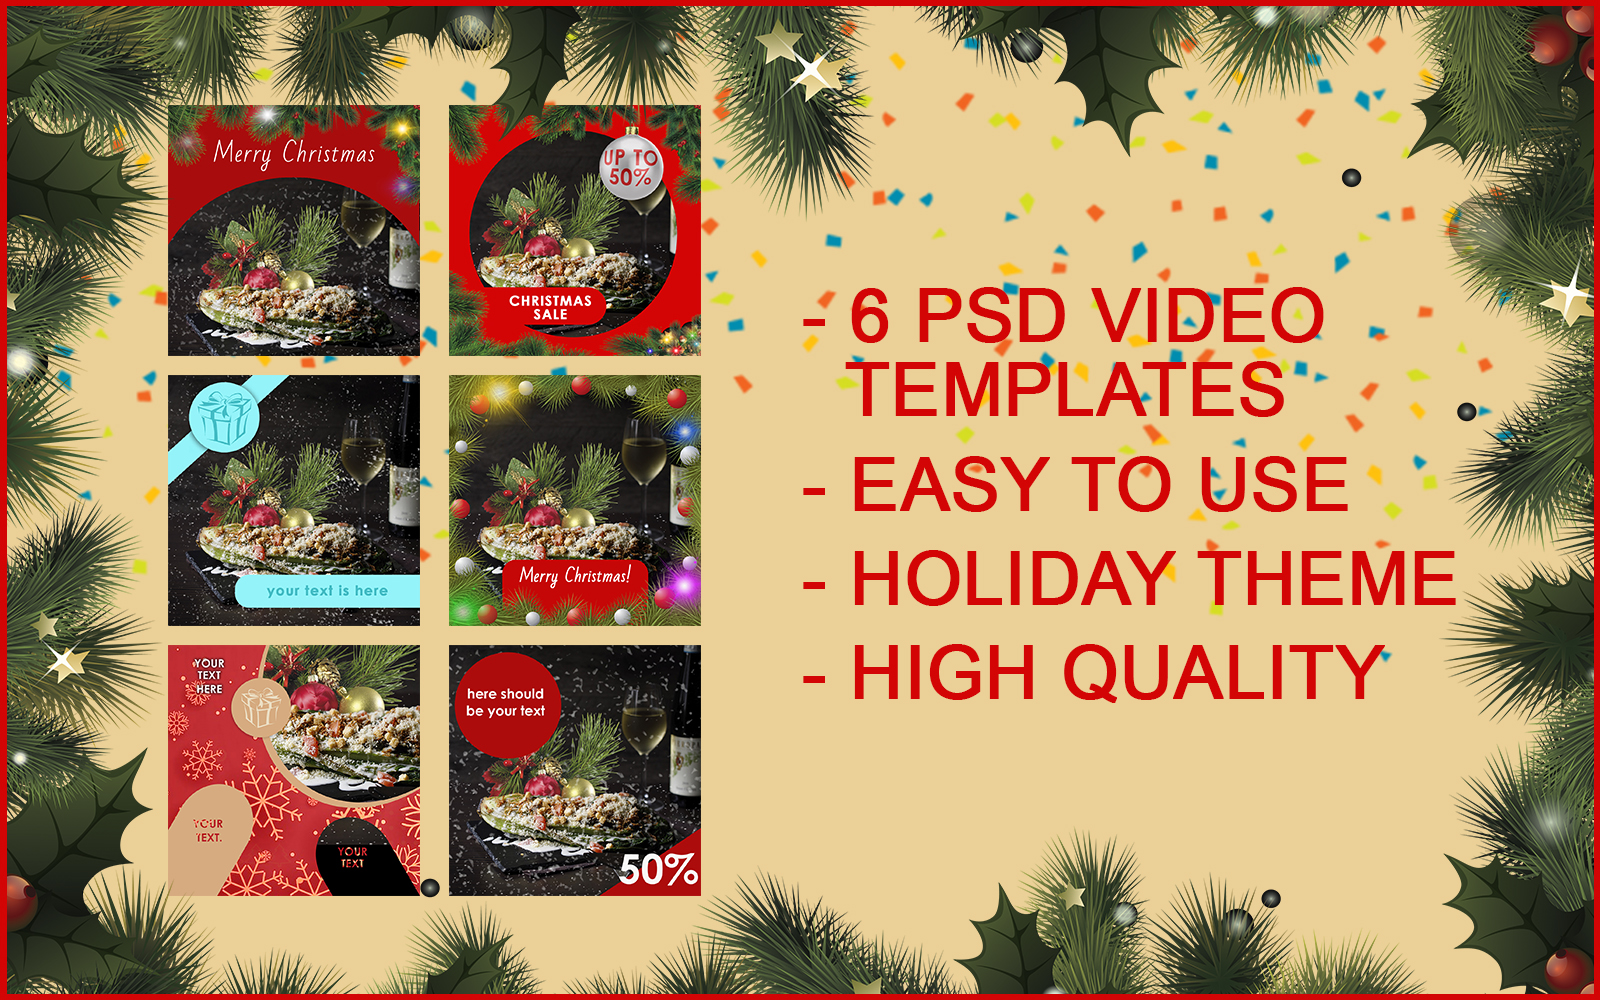 6 VIDEO TEMPLATES FOR INSTAGRAM PSD sablon 147693